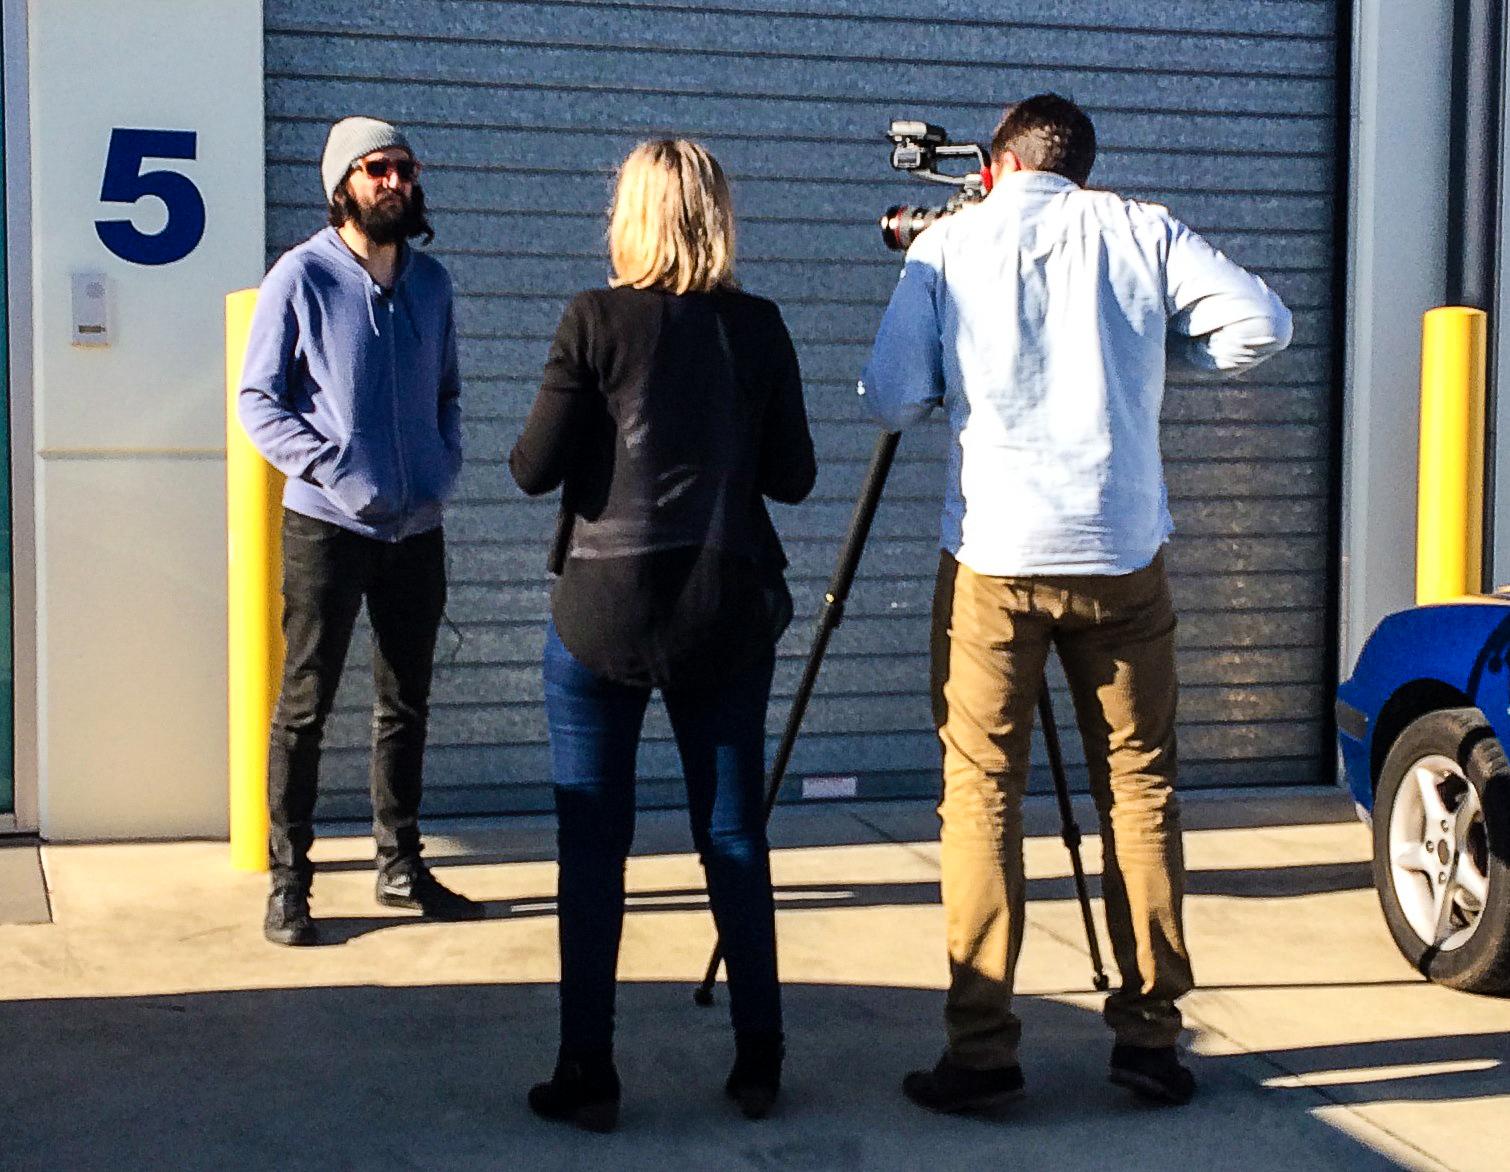 Stewart Hill being interviewed by Jasmine Gailer. Ben Trowse from Surge Media on camera.